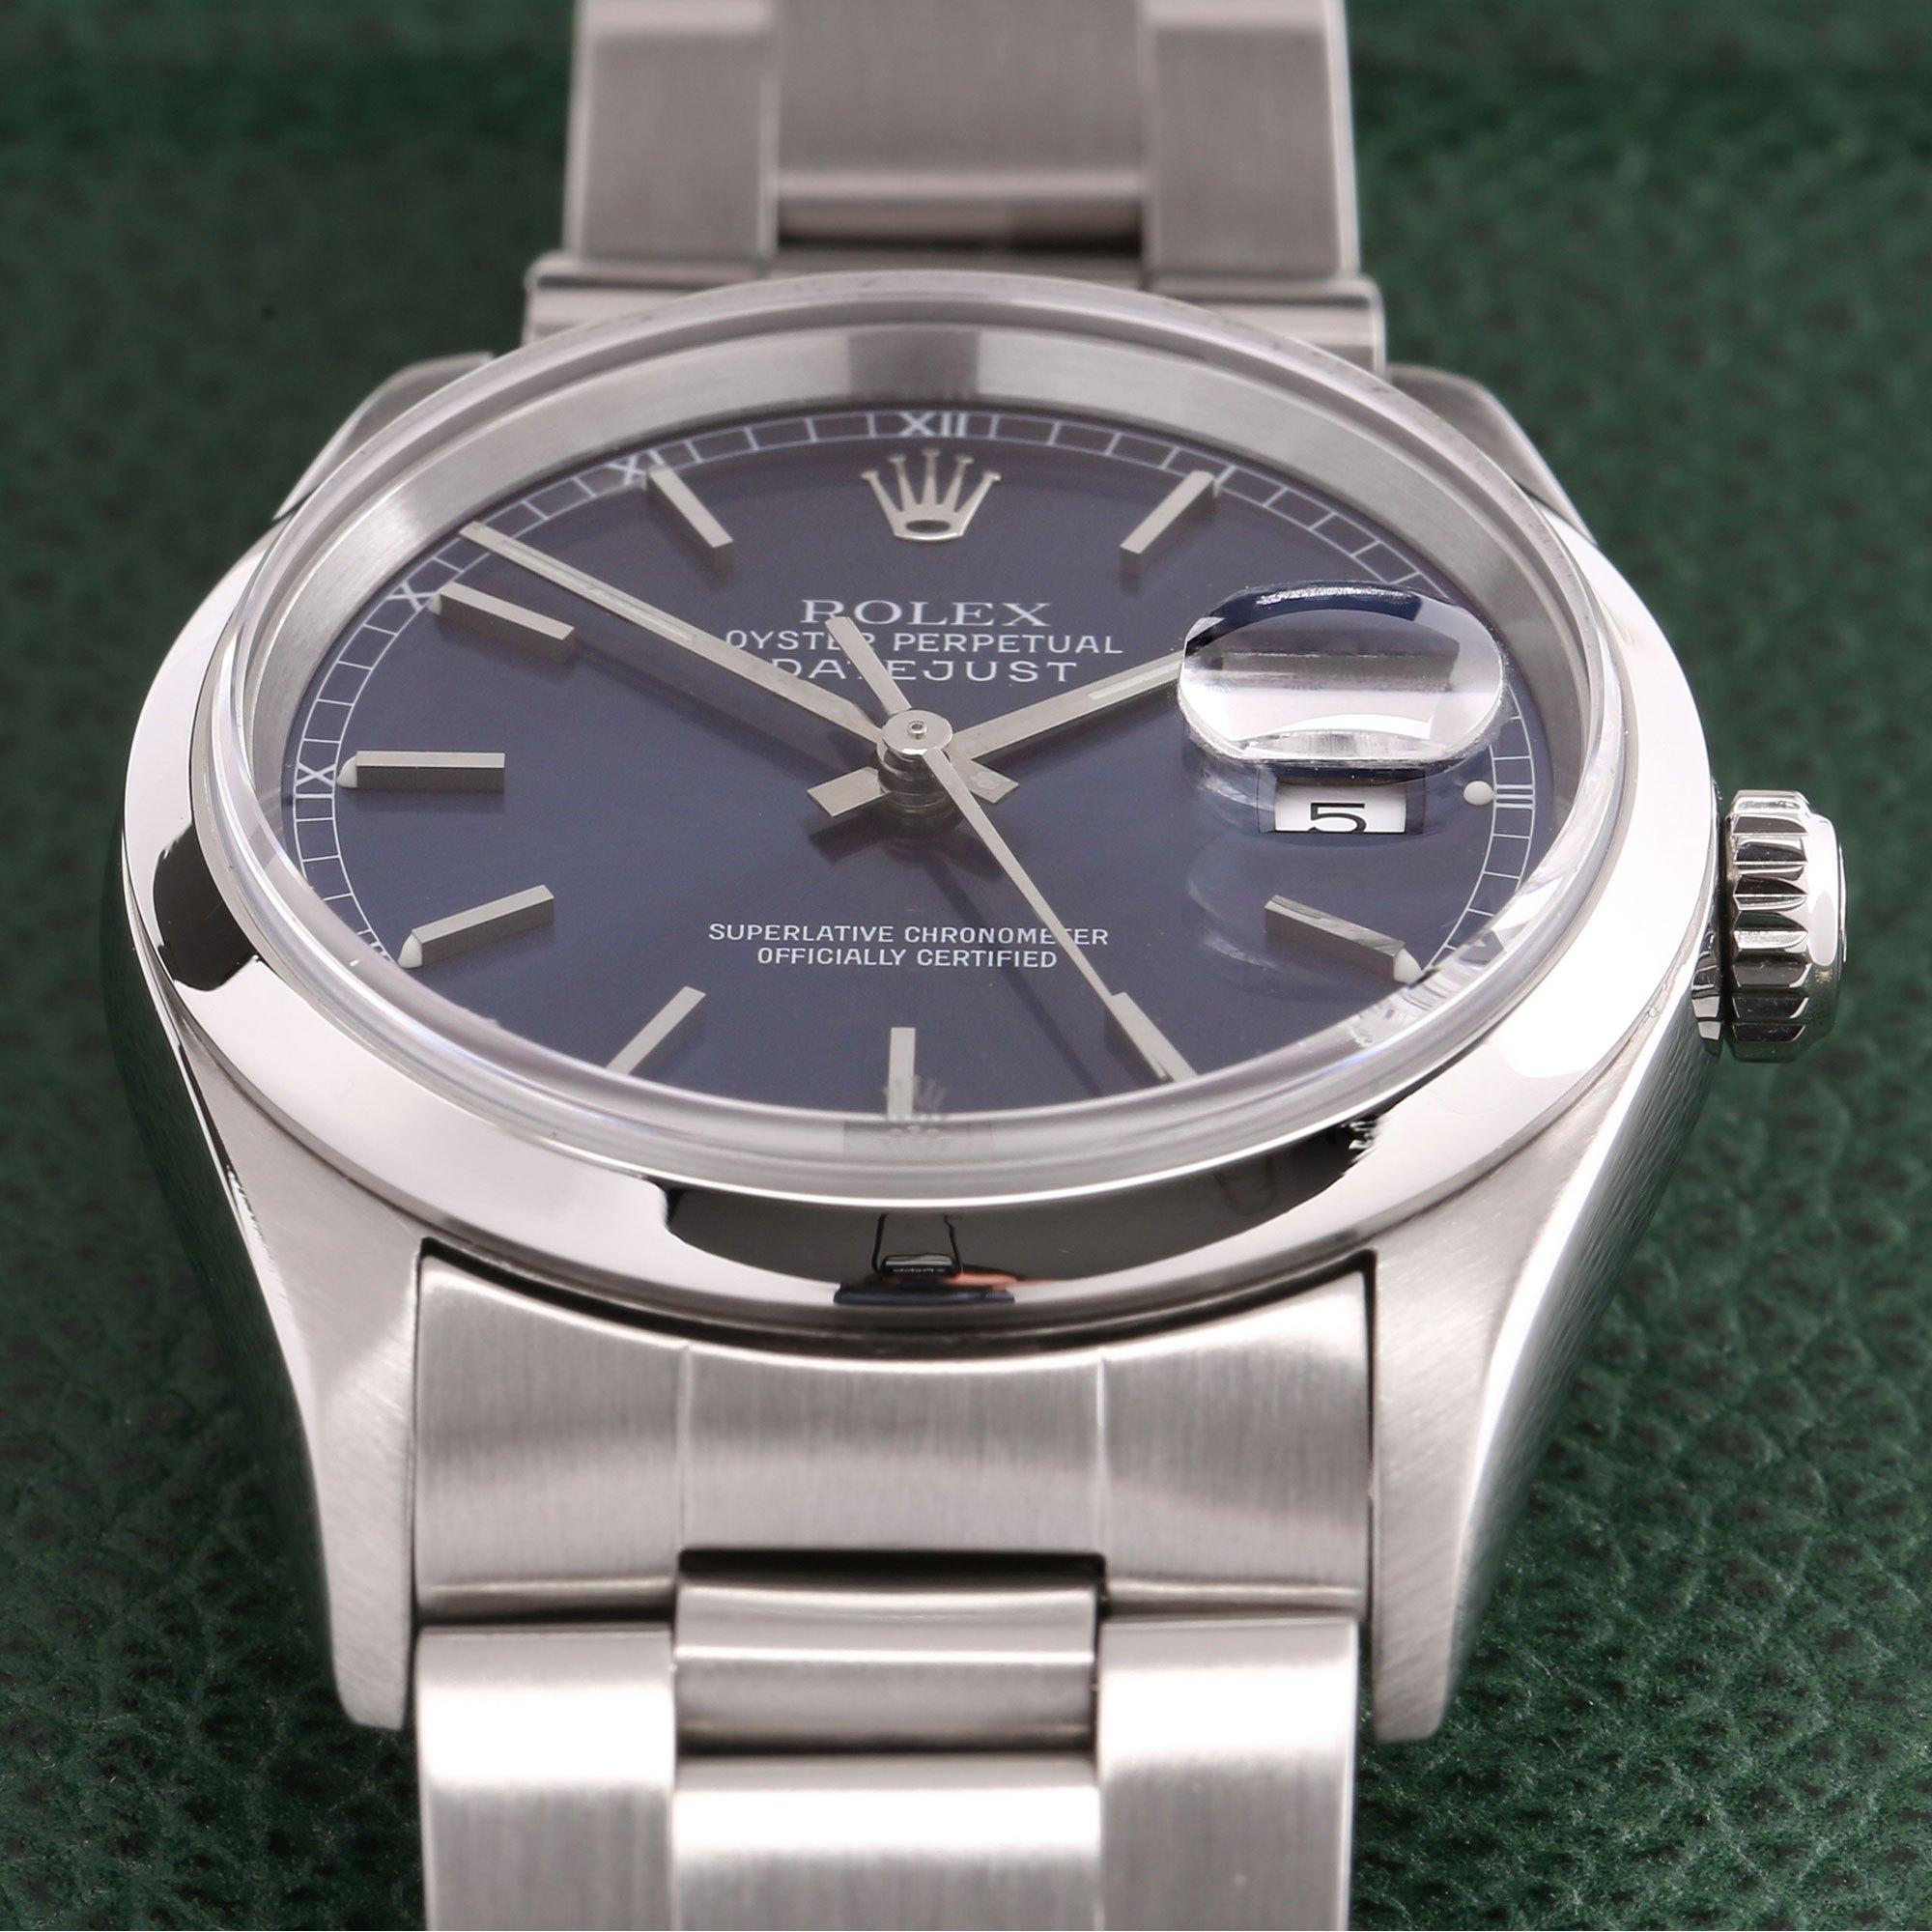 Rolex Datejust 36 Stainless Steel 16200